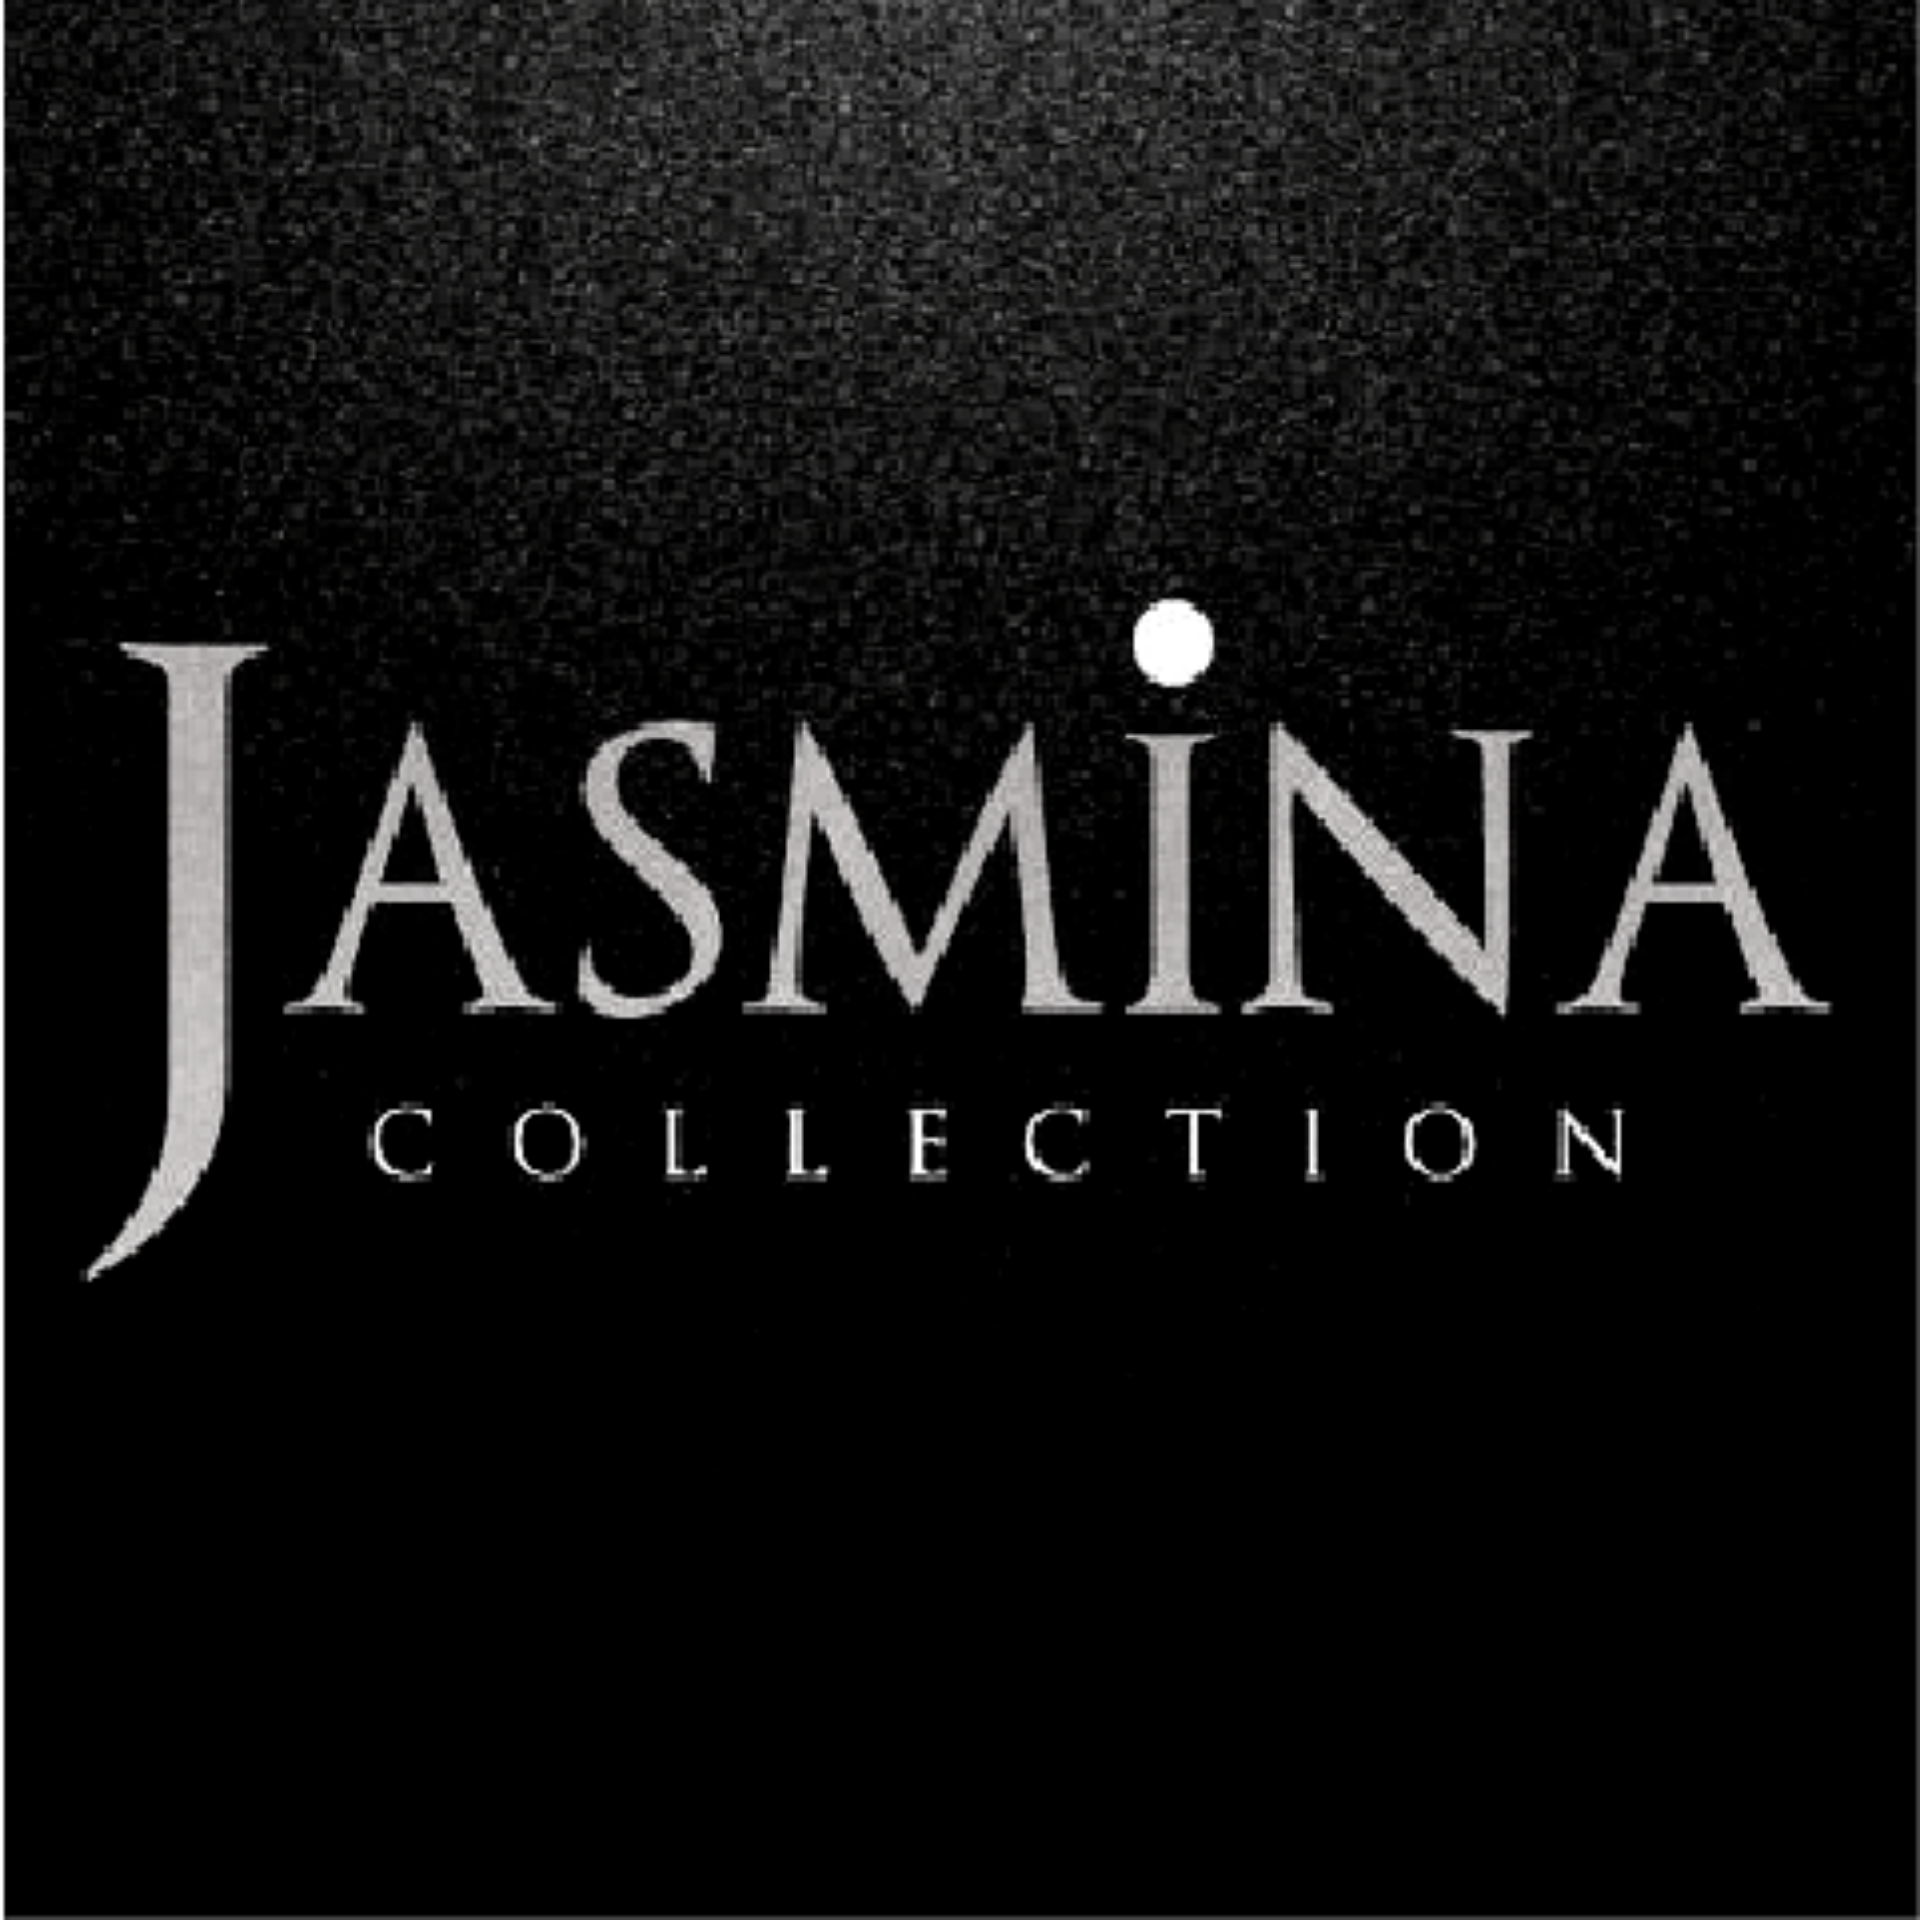 Jasmina collection for women